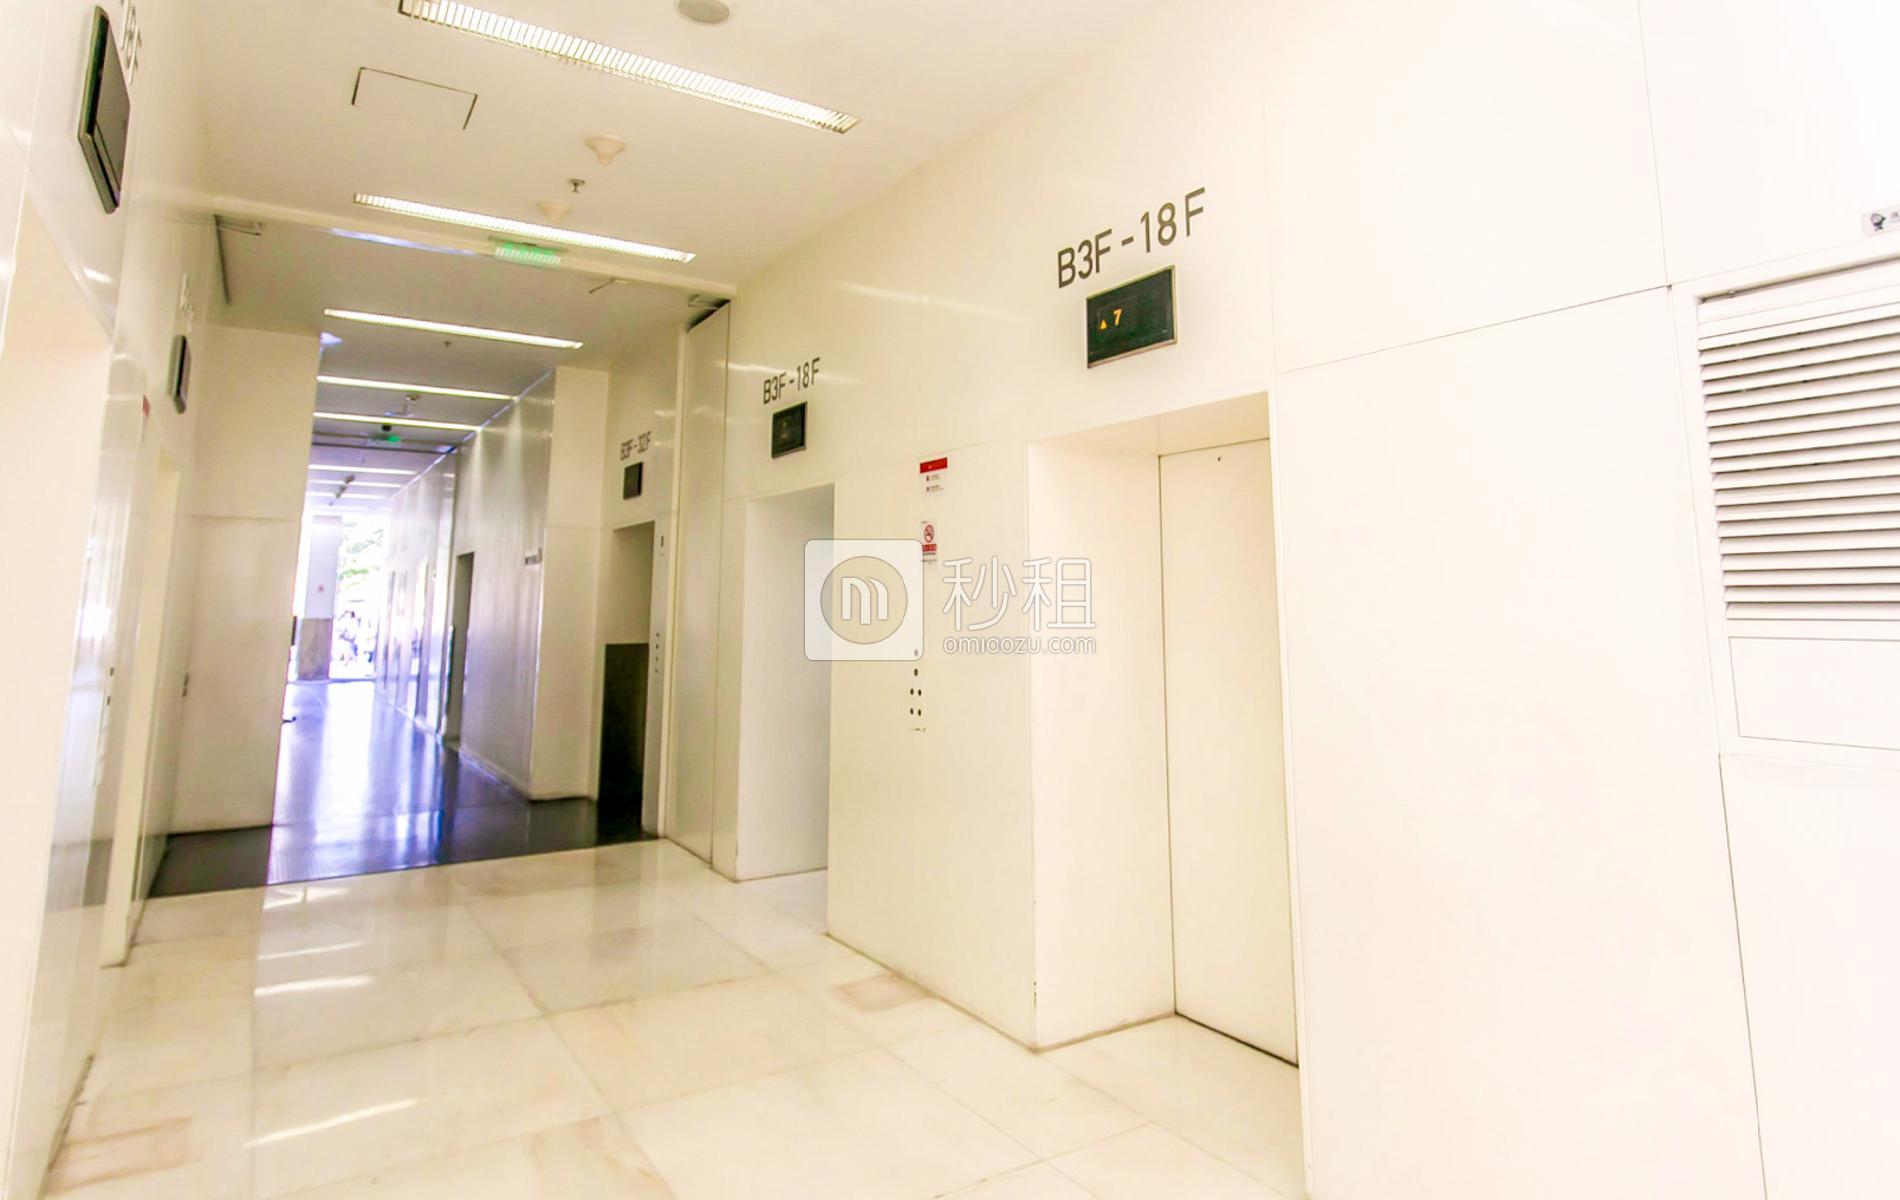 SOHO现代城写字楼出租/招租/租赁,SOHO现代城办公室出租/招租/租赁